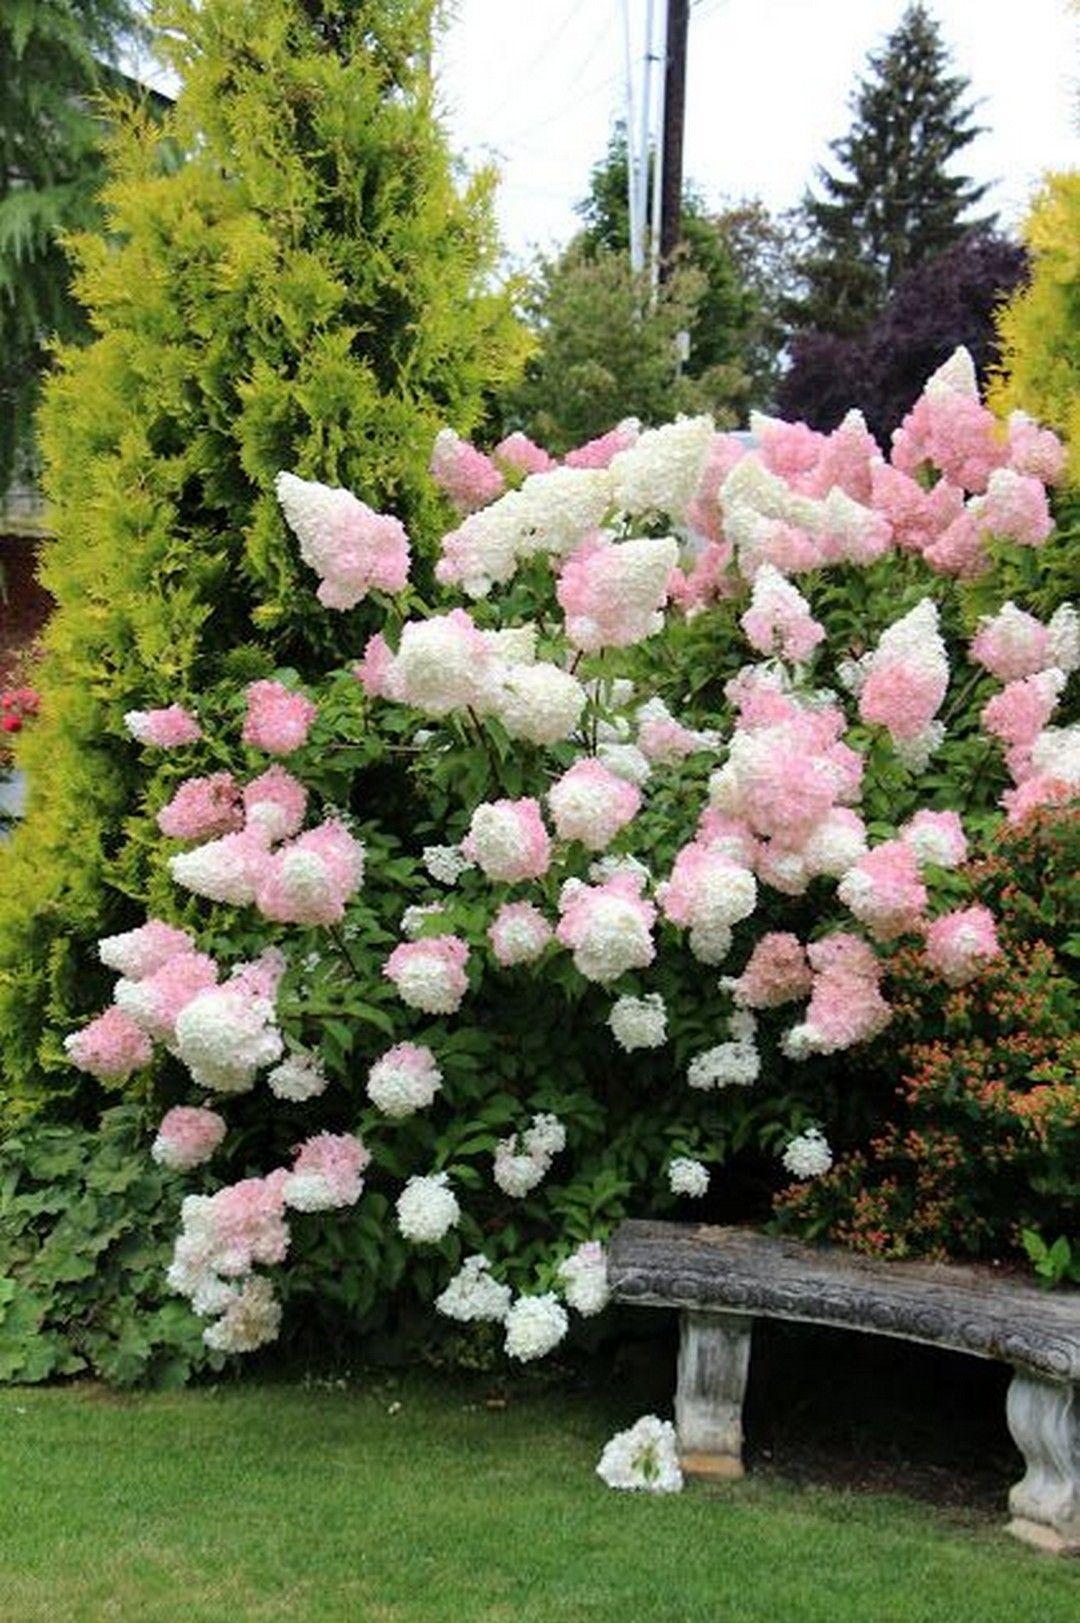 Hydrangeas Paisagens Pinterest Hydrangea Gardens and Flowers